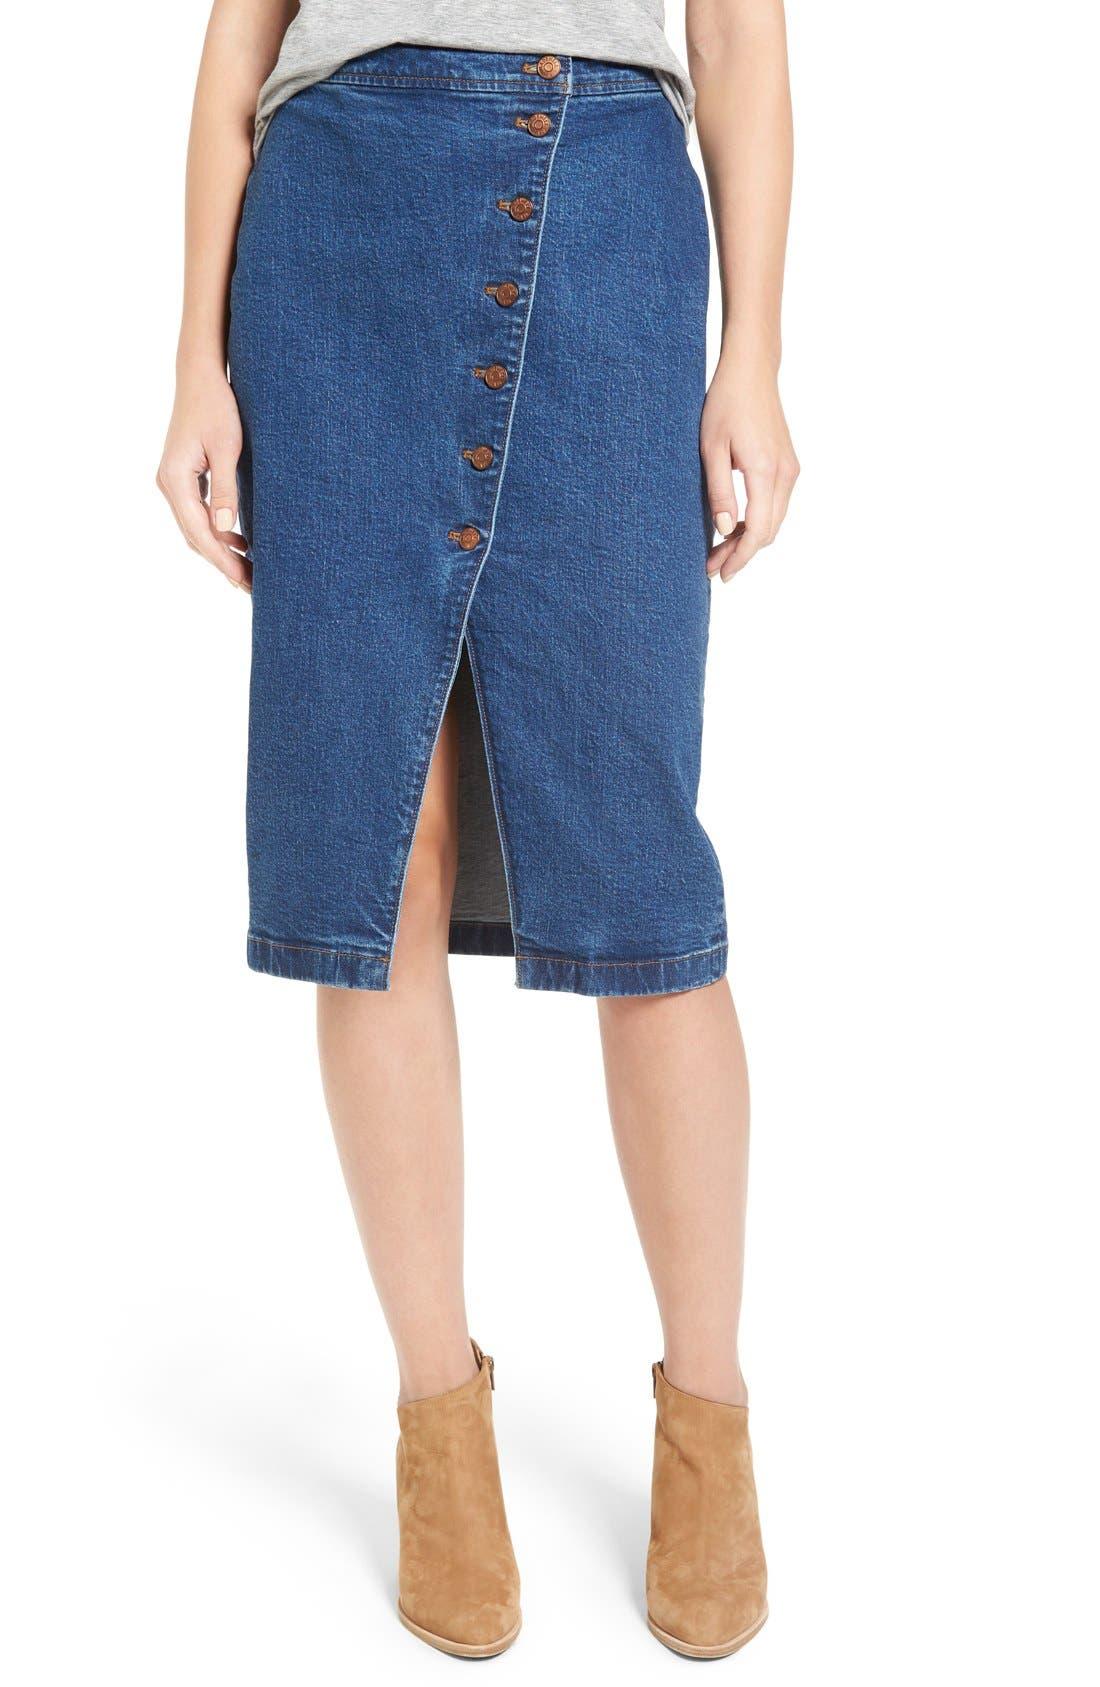 Alternate Image 1 Selected - Madewell Denim Midi Skirt